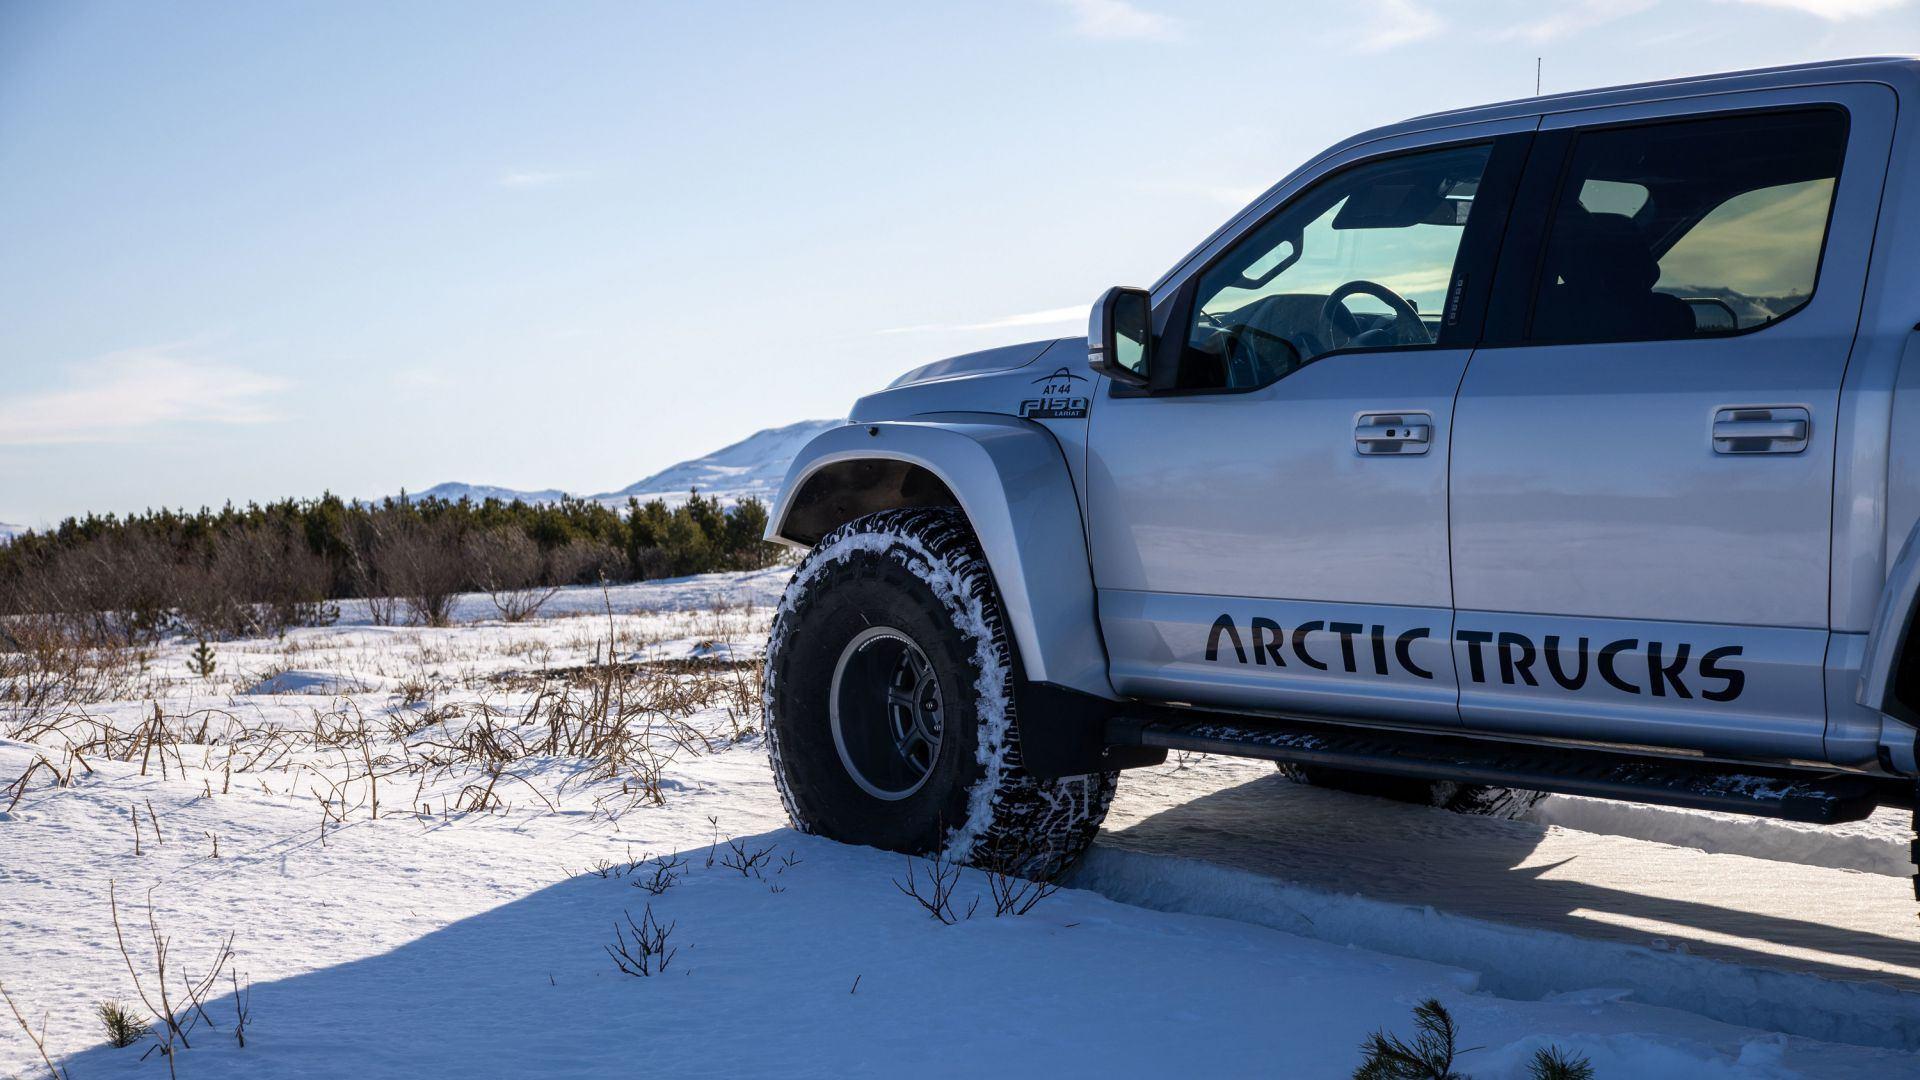 Arctic Trucks Ford F-150 AT44 Prototype